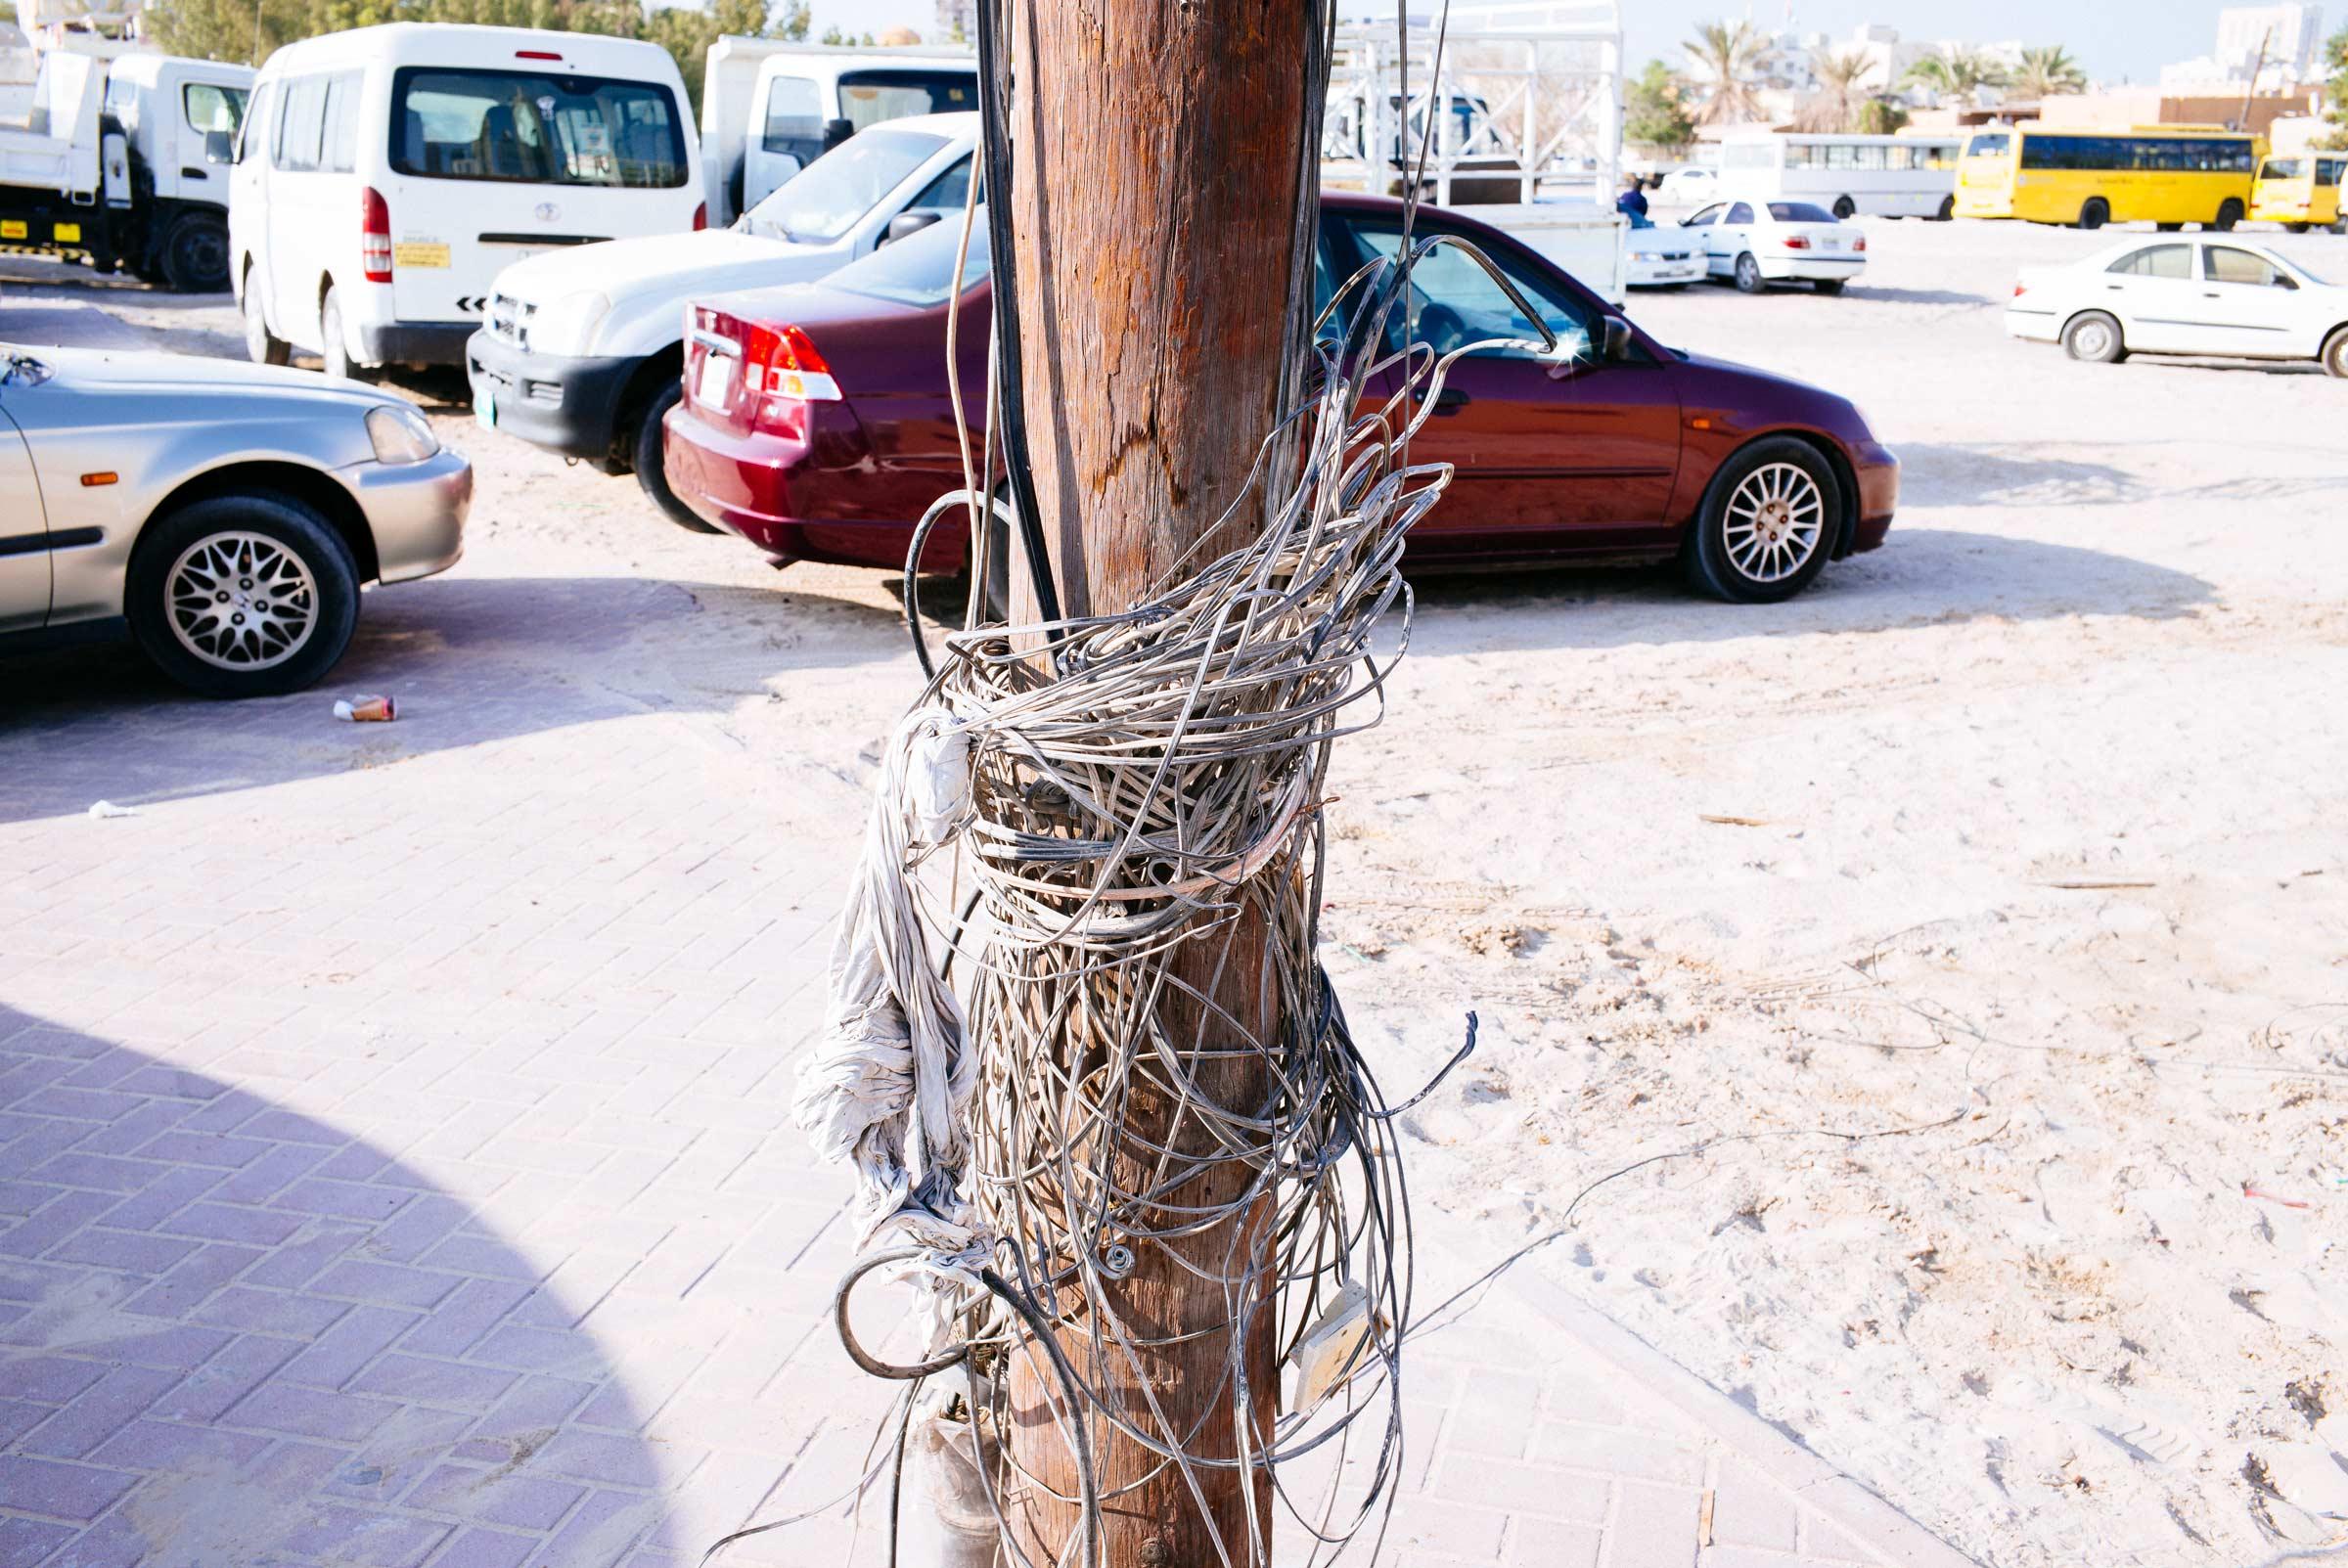 telephone-wire-on-pole.jpg